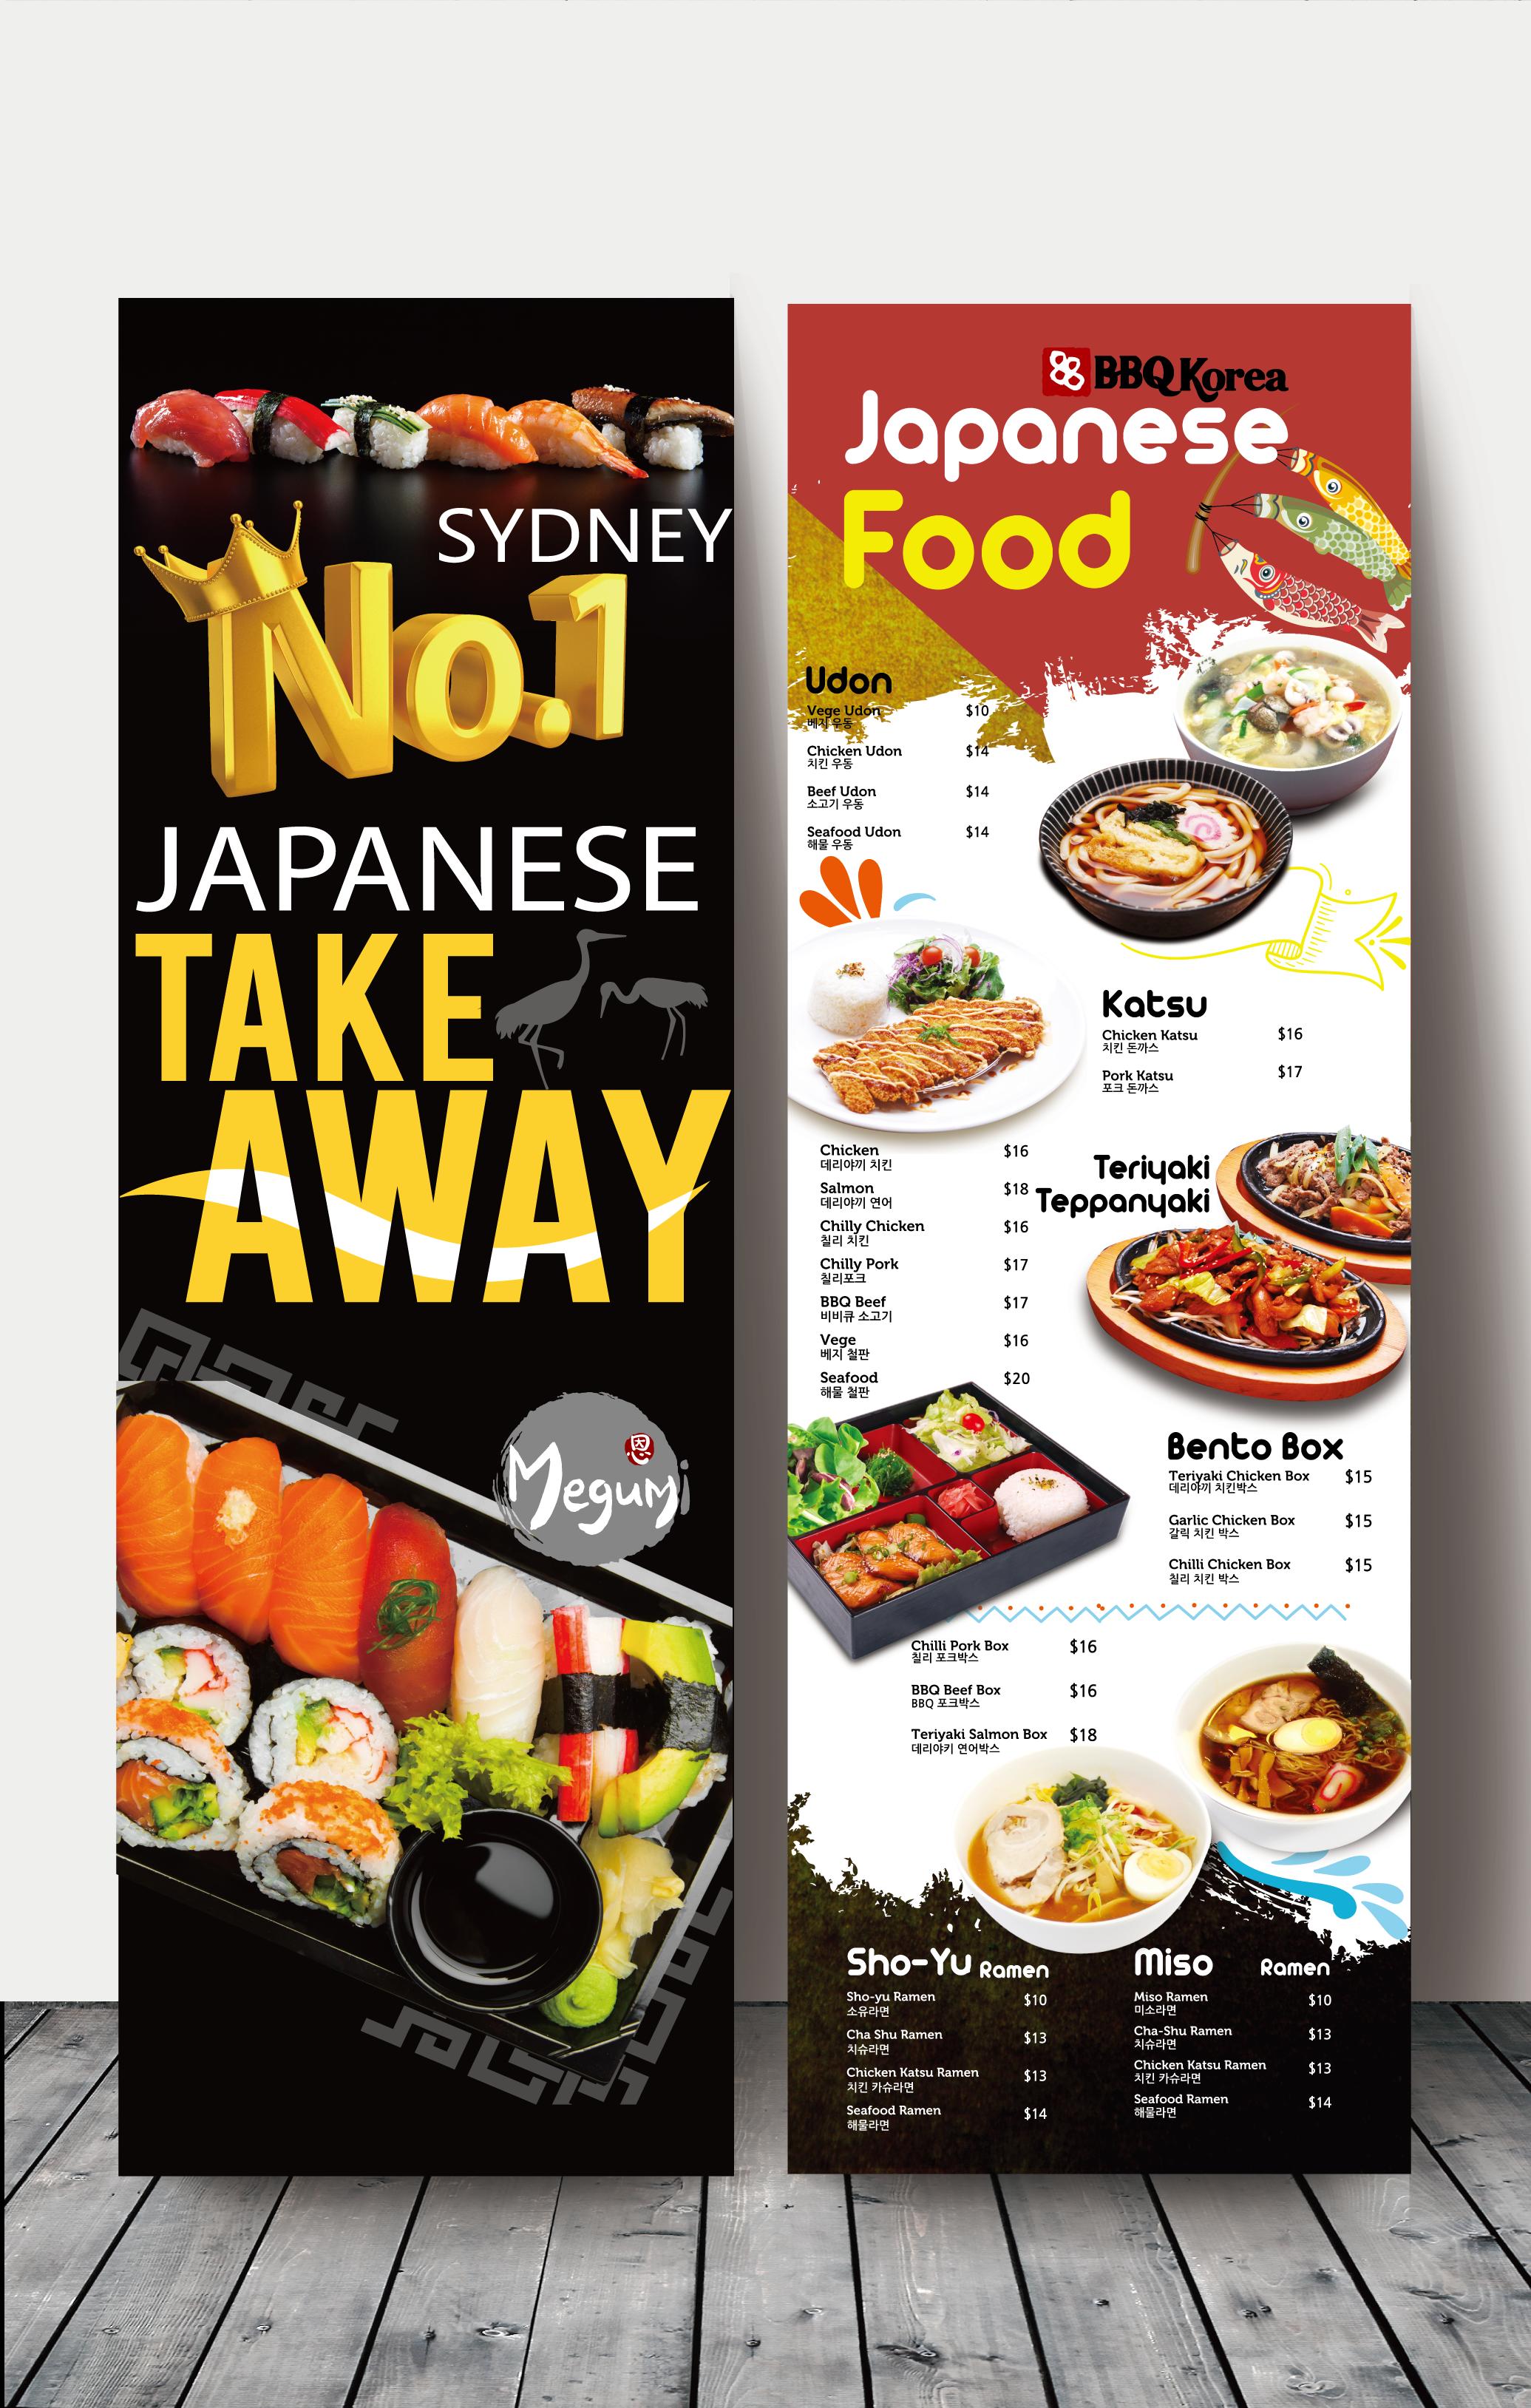 Desain Spanduk Makanan : desain, spanduk, makanan, Bhavesh, Supermarket, Desain, Makanan,, Makanan, Minuman,